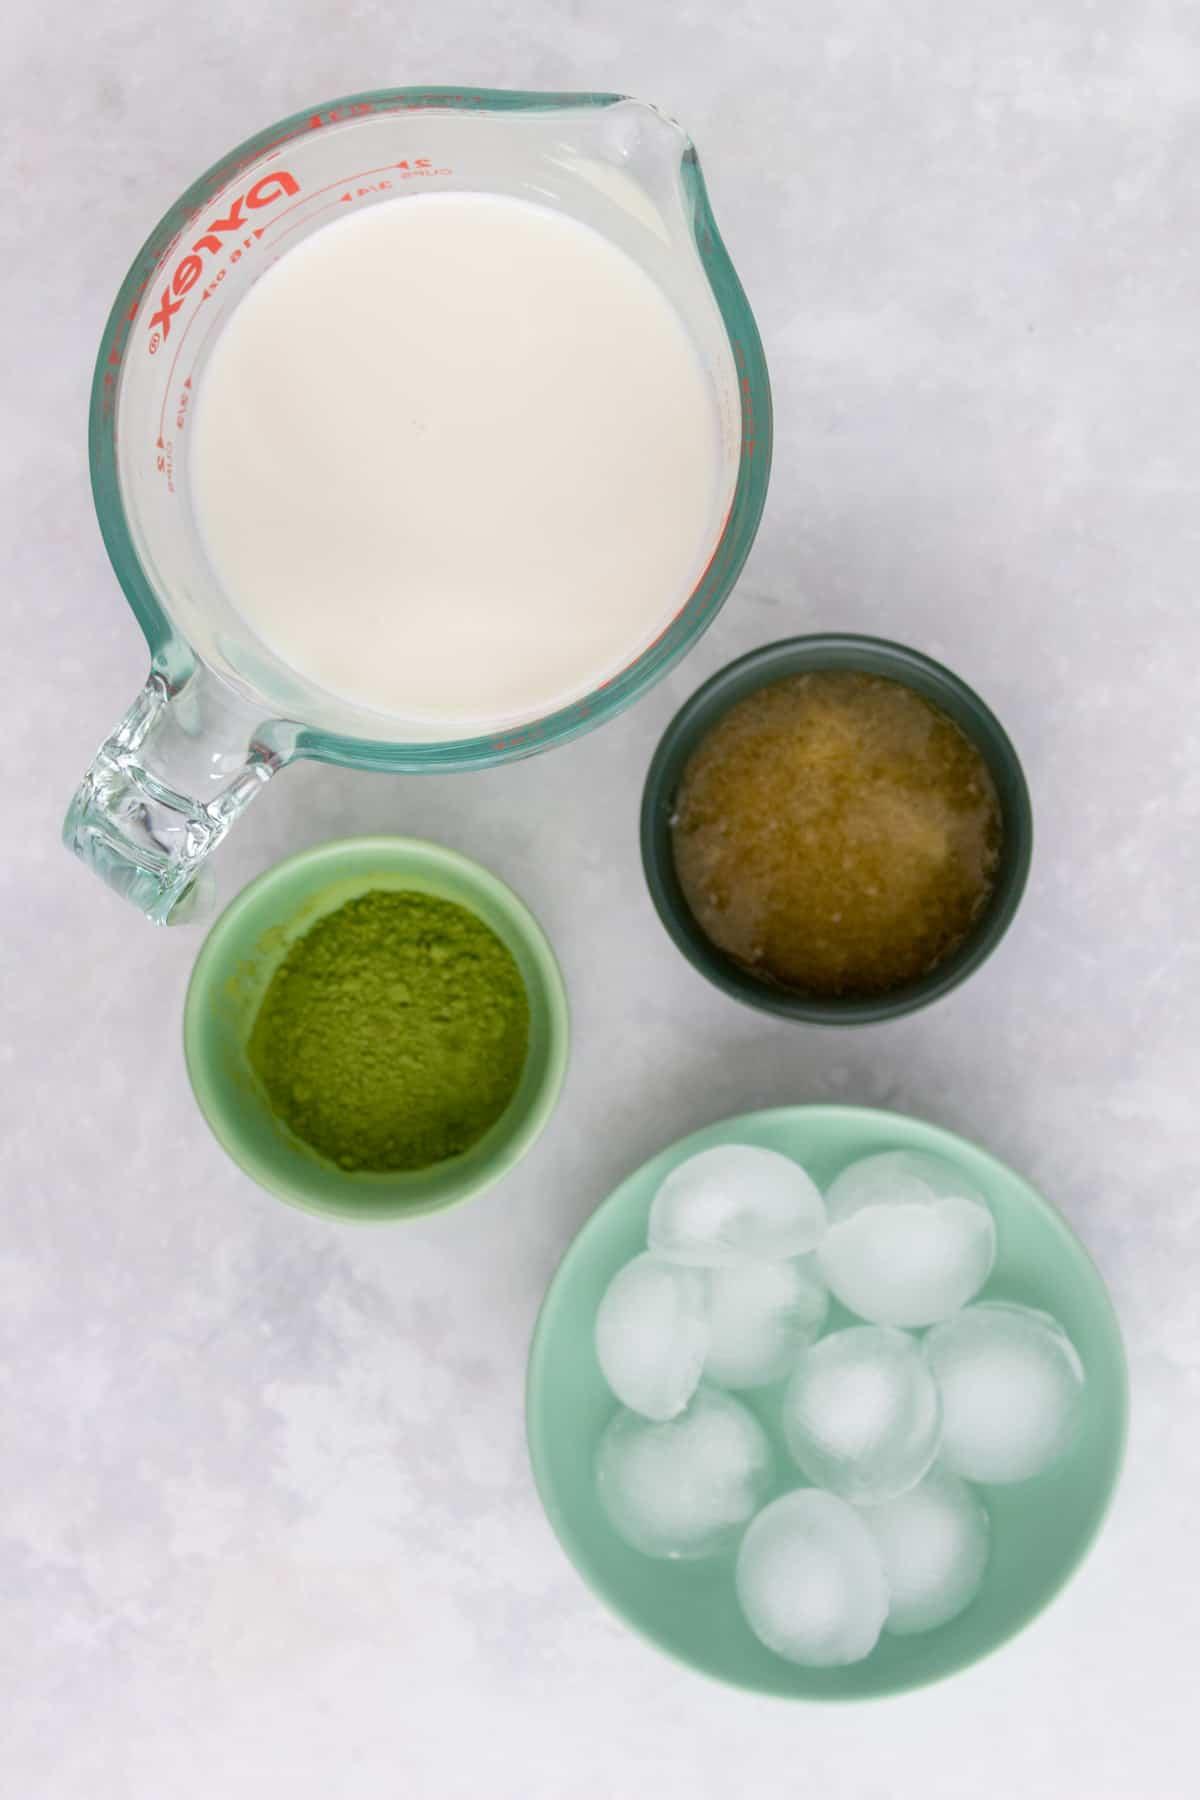 Ingredients needed to make matcha latte.